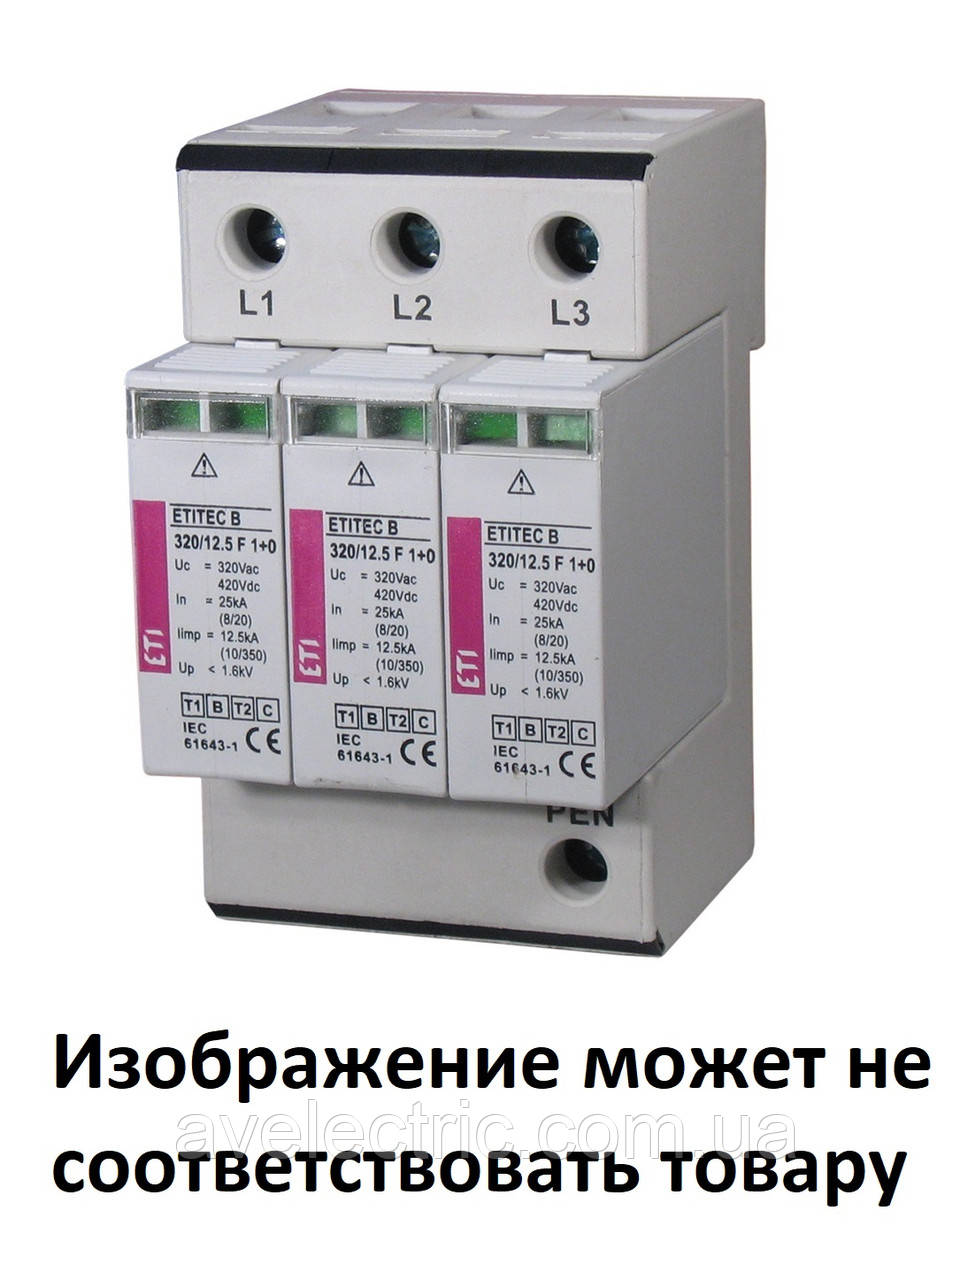 Обмежувач перенапруги ETITEC B T12 440/12,5 (4+0) 4p